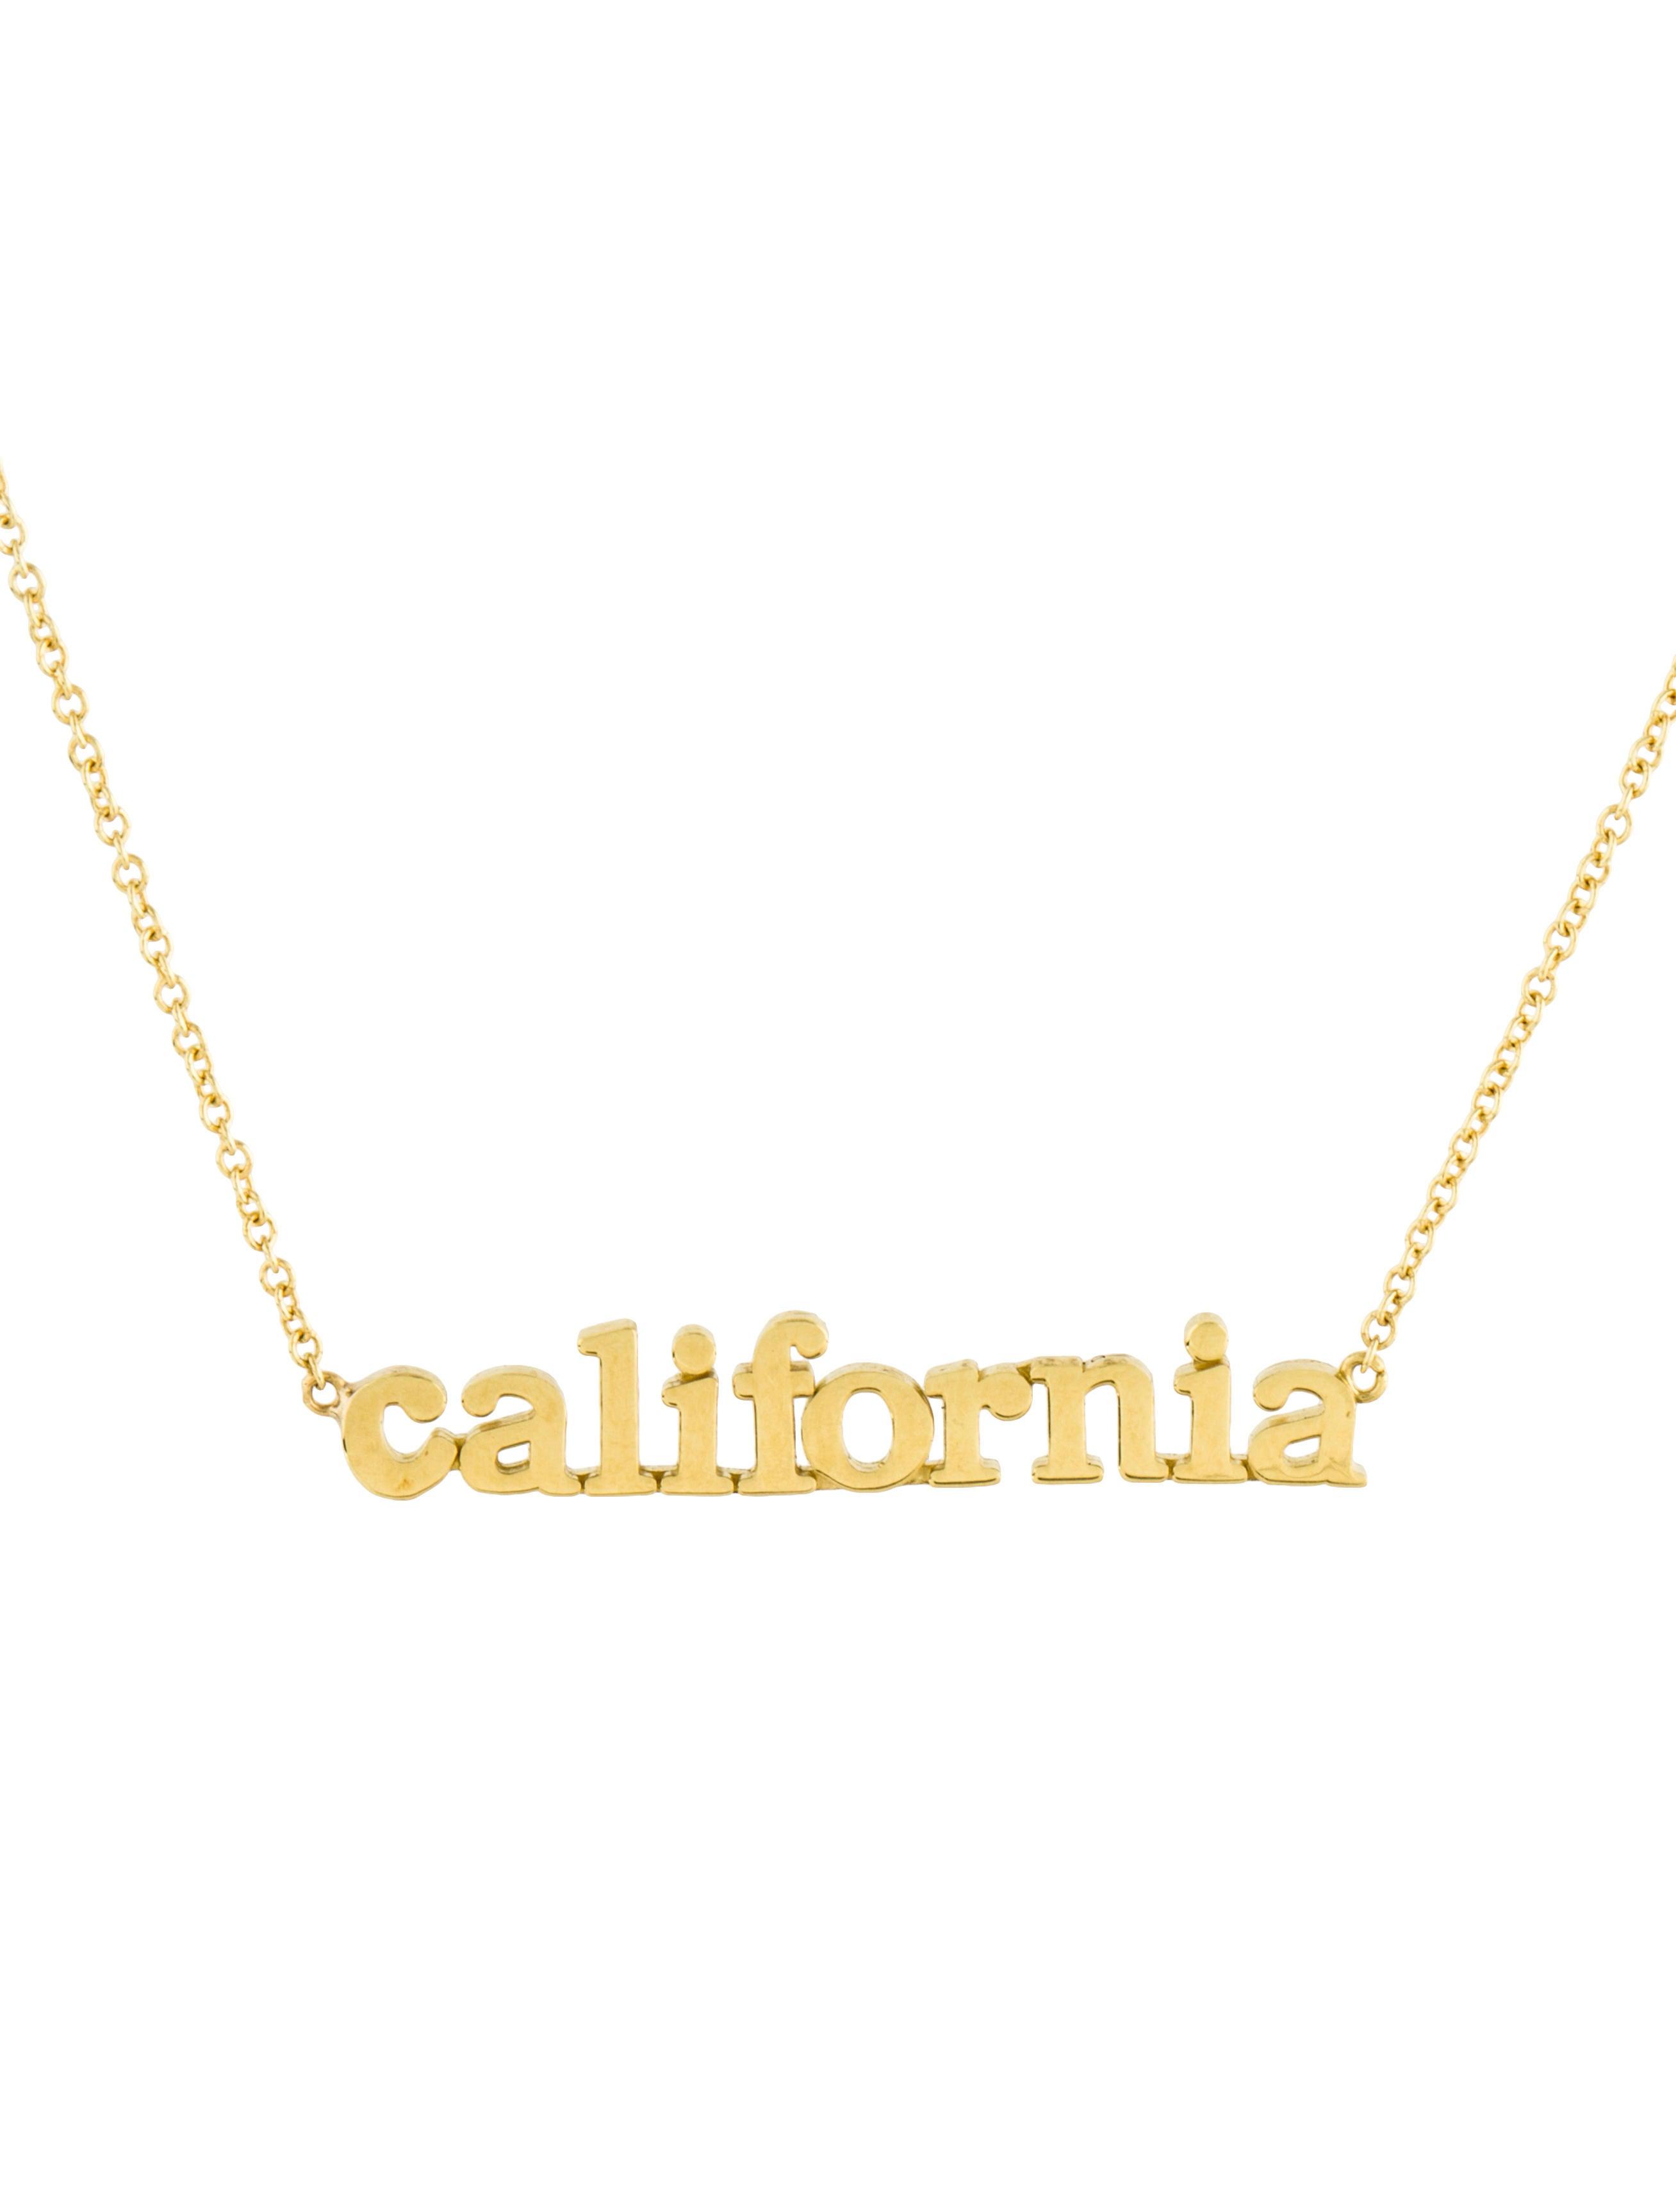 Jennifer meyer 18k california pendant necklace necklaces 18k california pendant necklace aloadofball Image collections